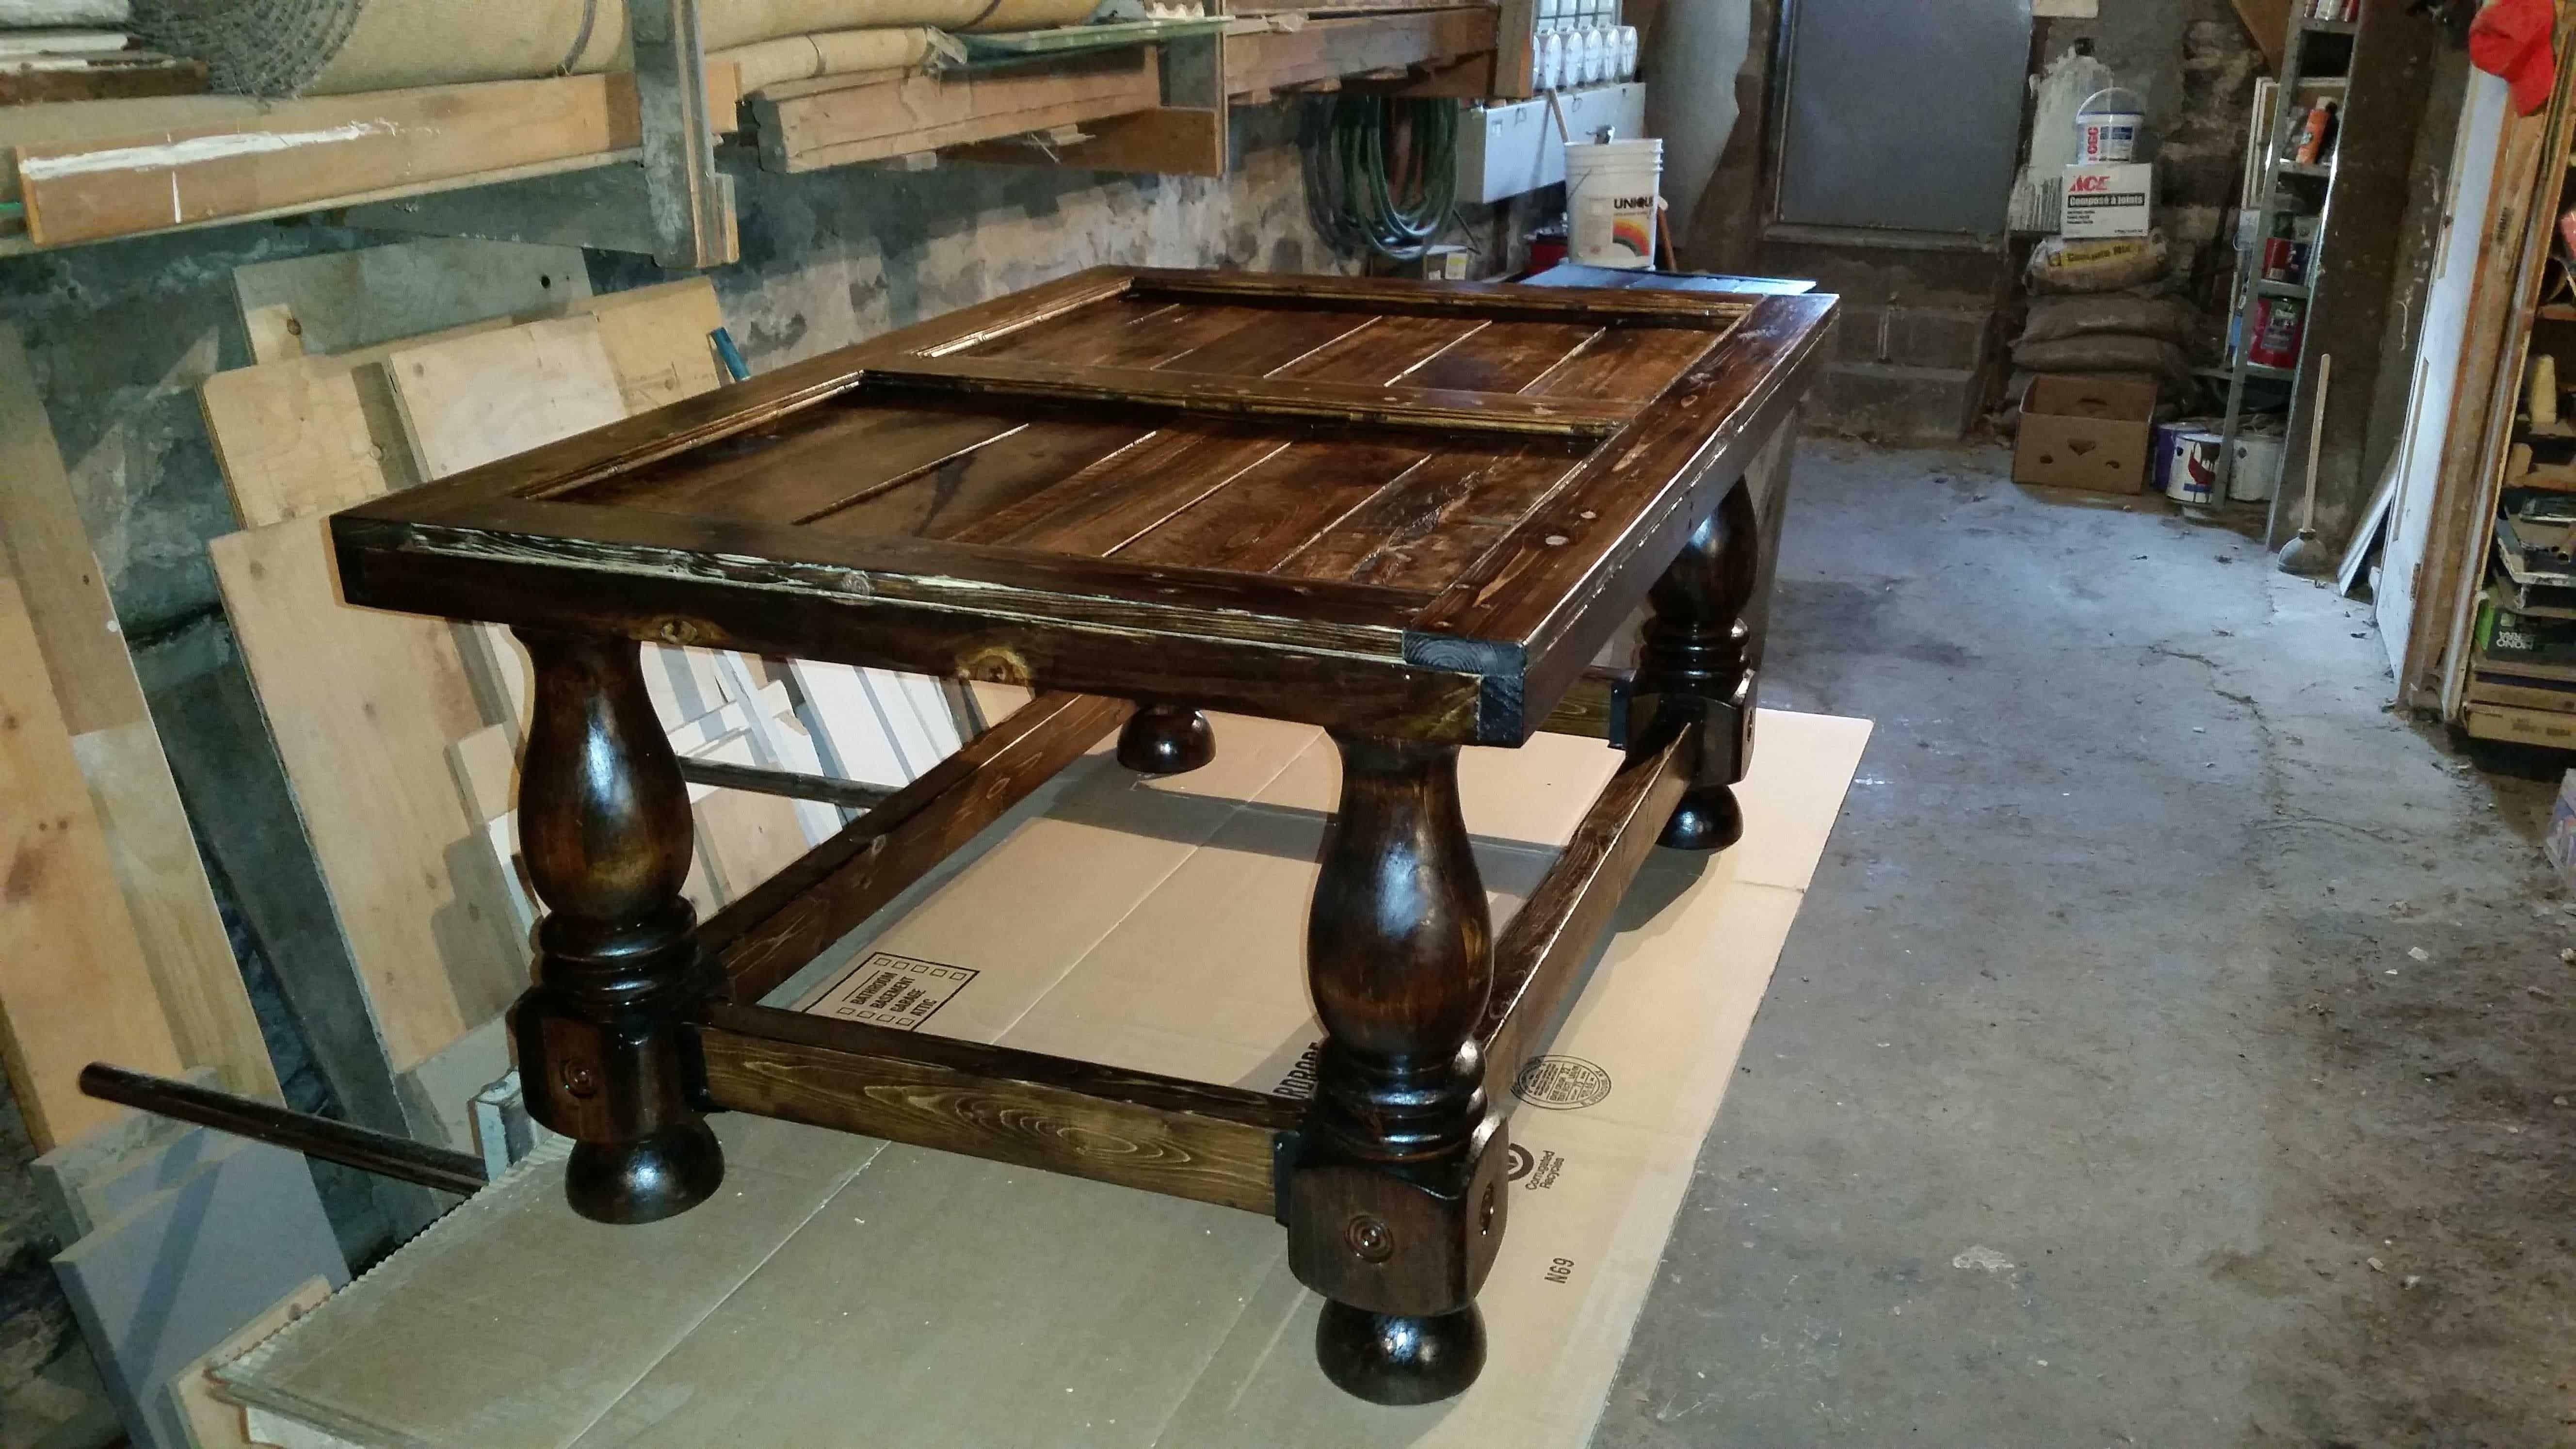 Reclaimed Wood Pallet Wood Coffee Table 1001 Pallets In 2020 Pallet Furniture Coffee Table Pallet Wood Coffee Table Reclaimed Wood Coffee Table